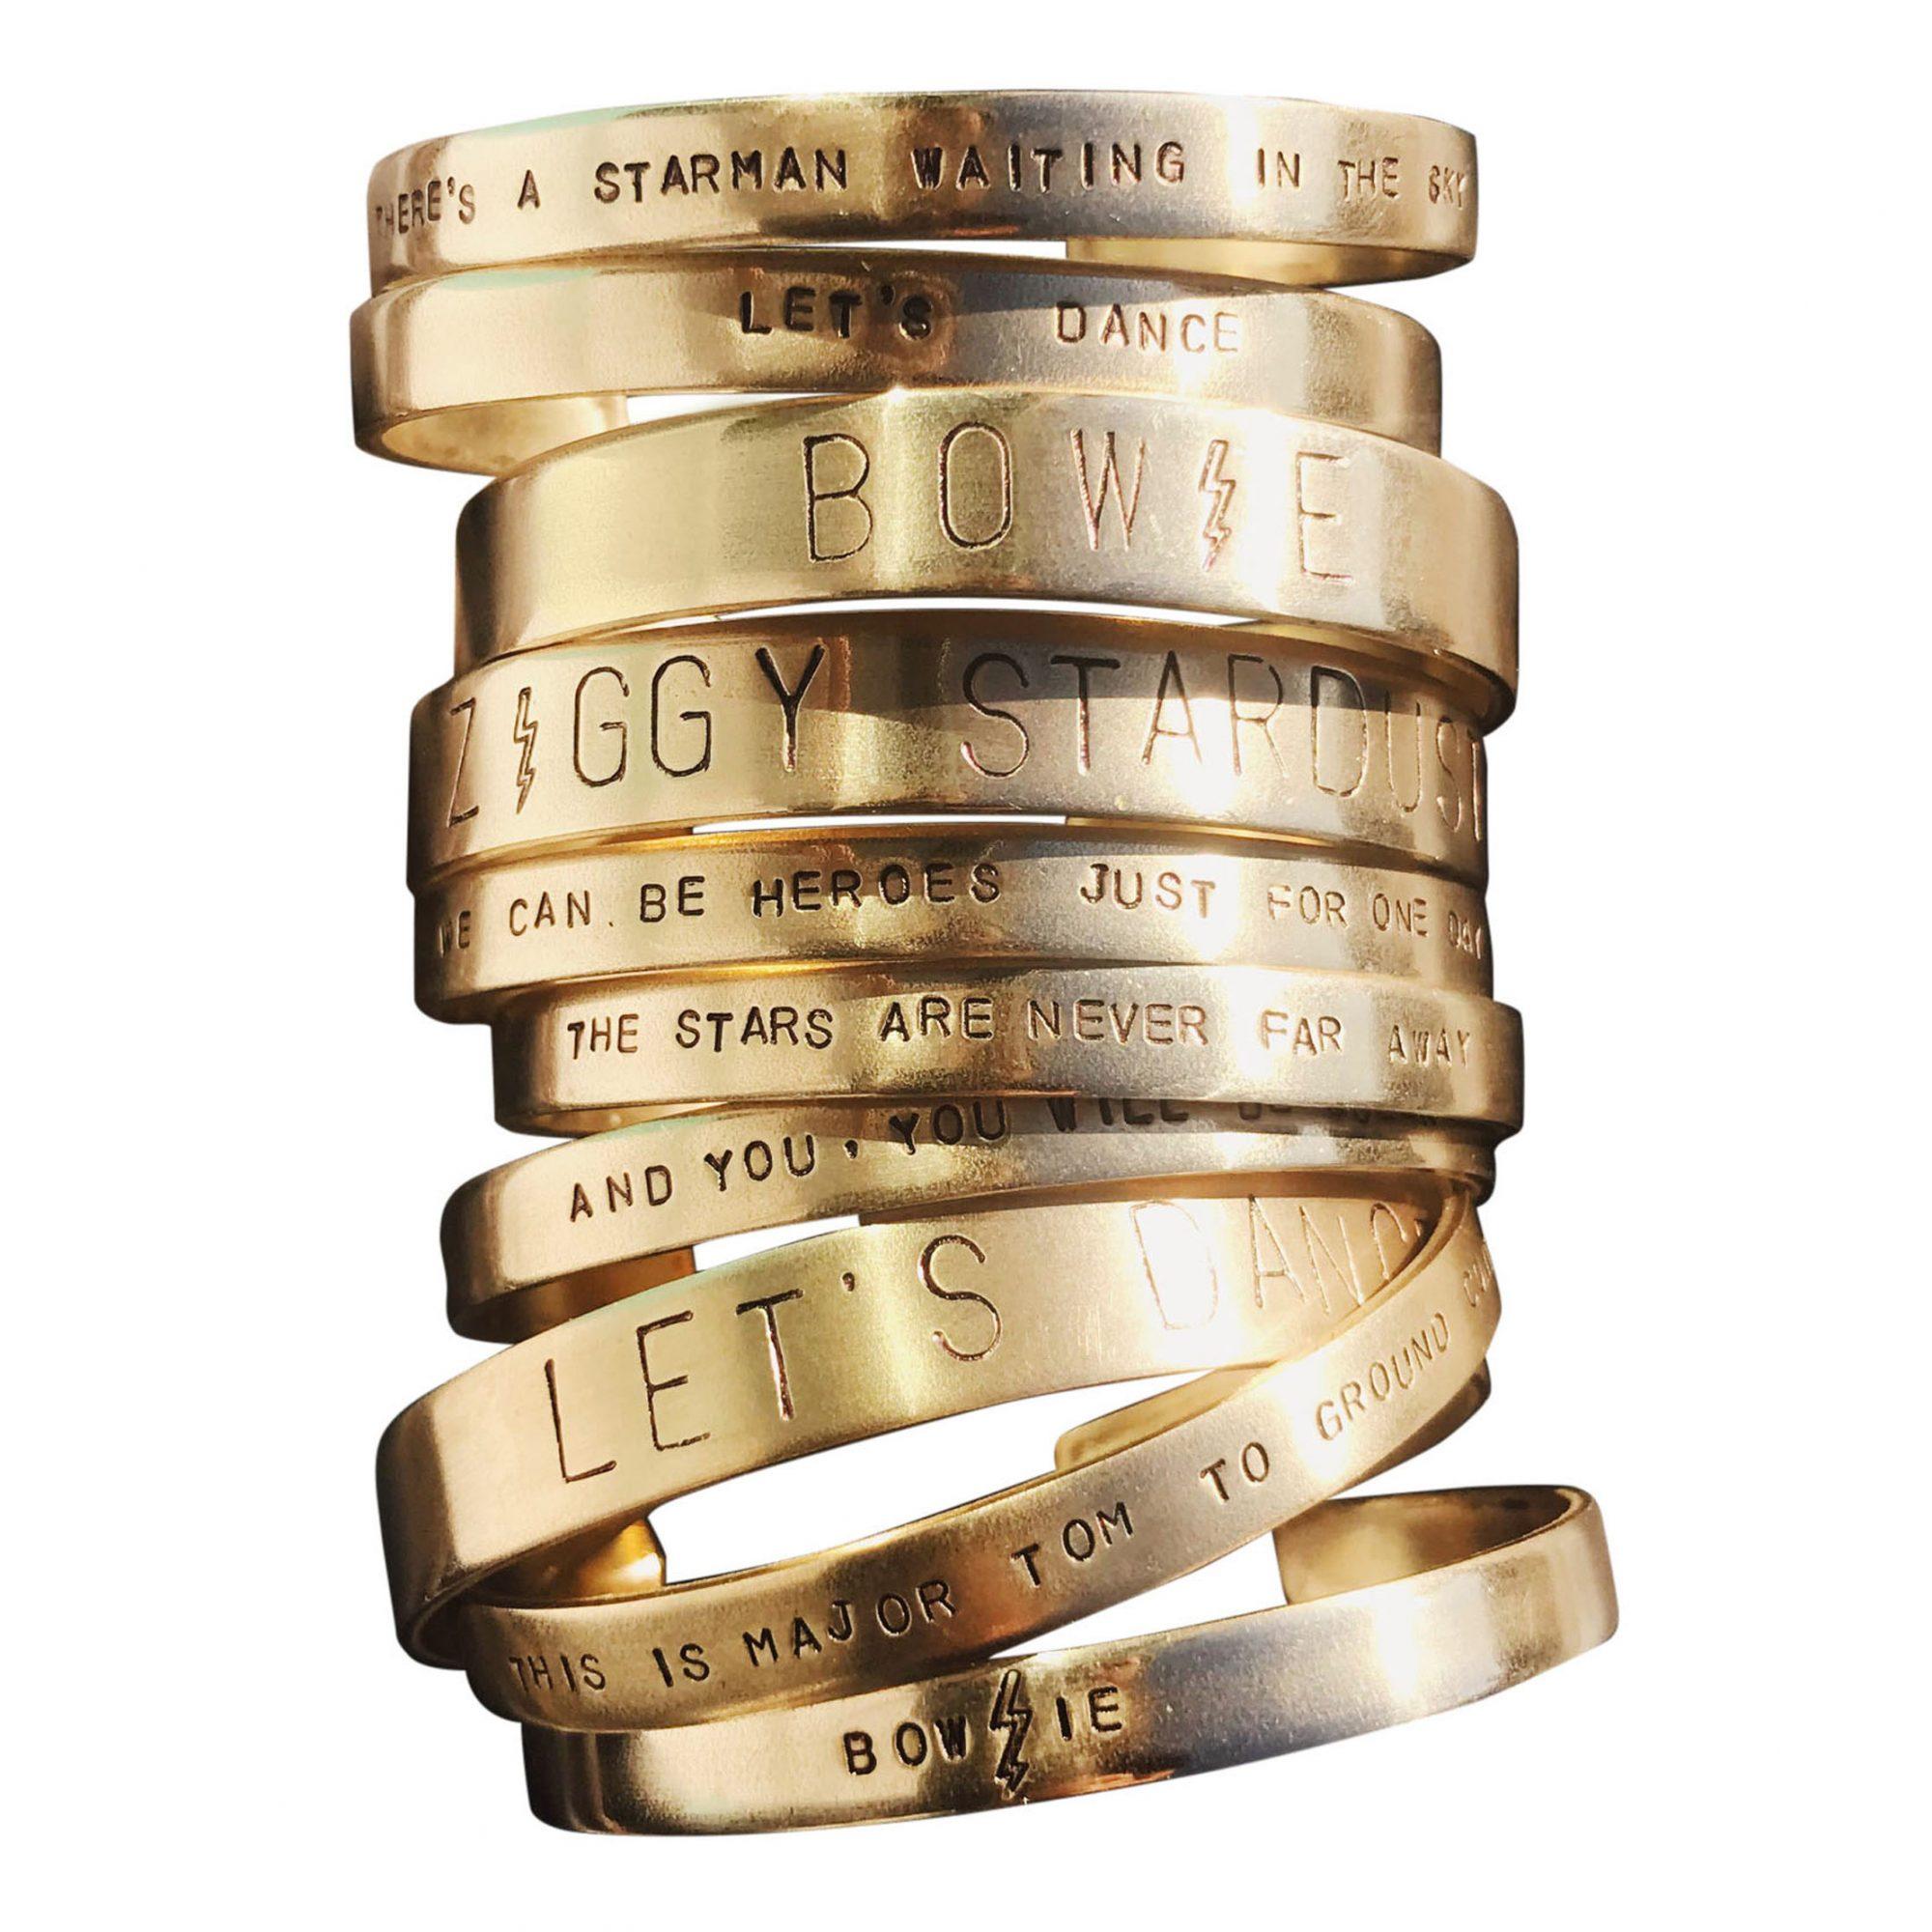 Edge of Urge Hand-Stamped Cuffs